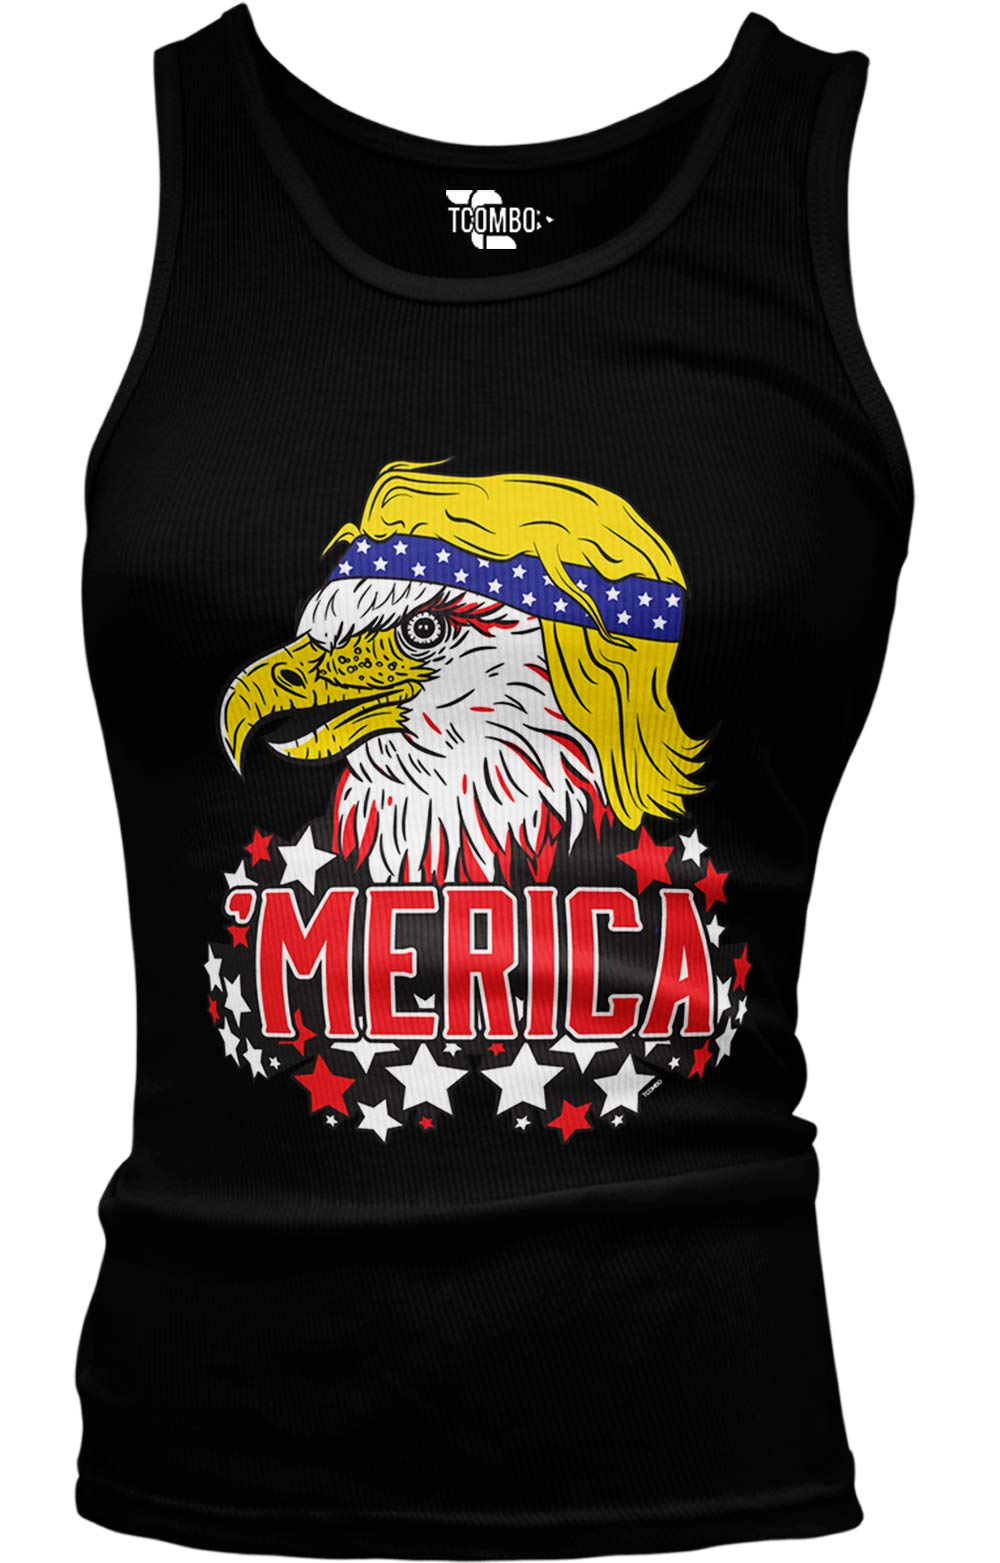 Eagle Merica Tank Top 9491 Shirts